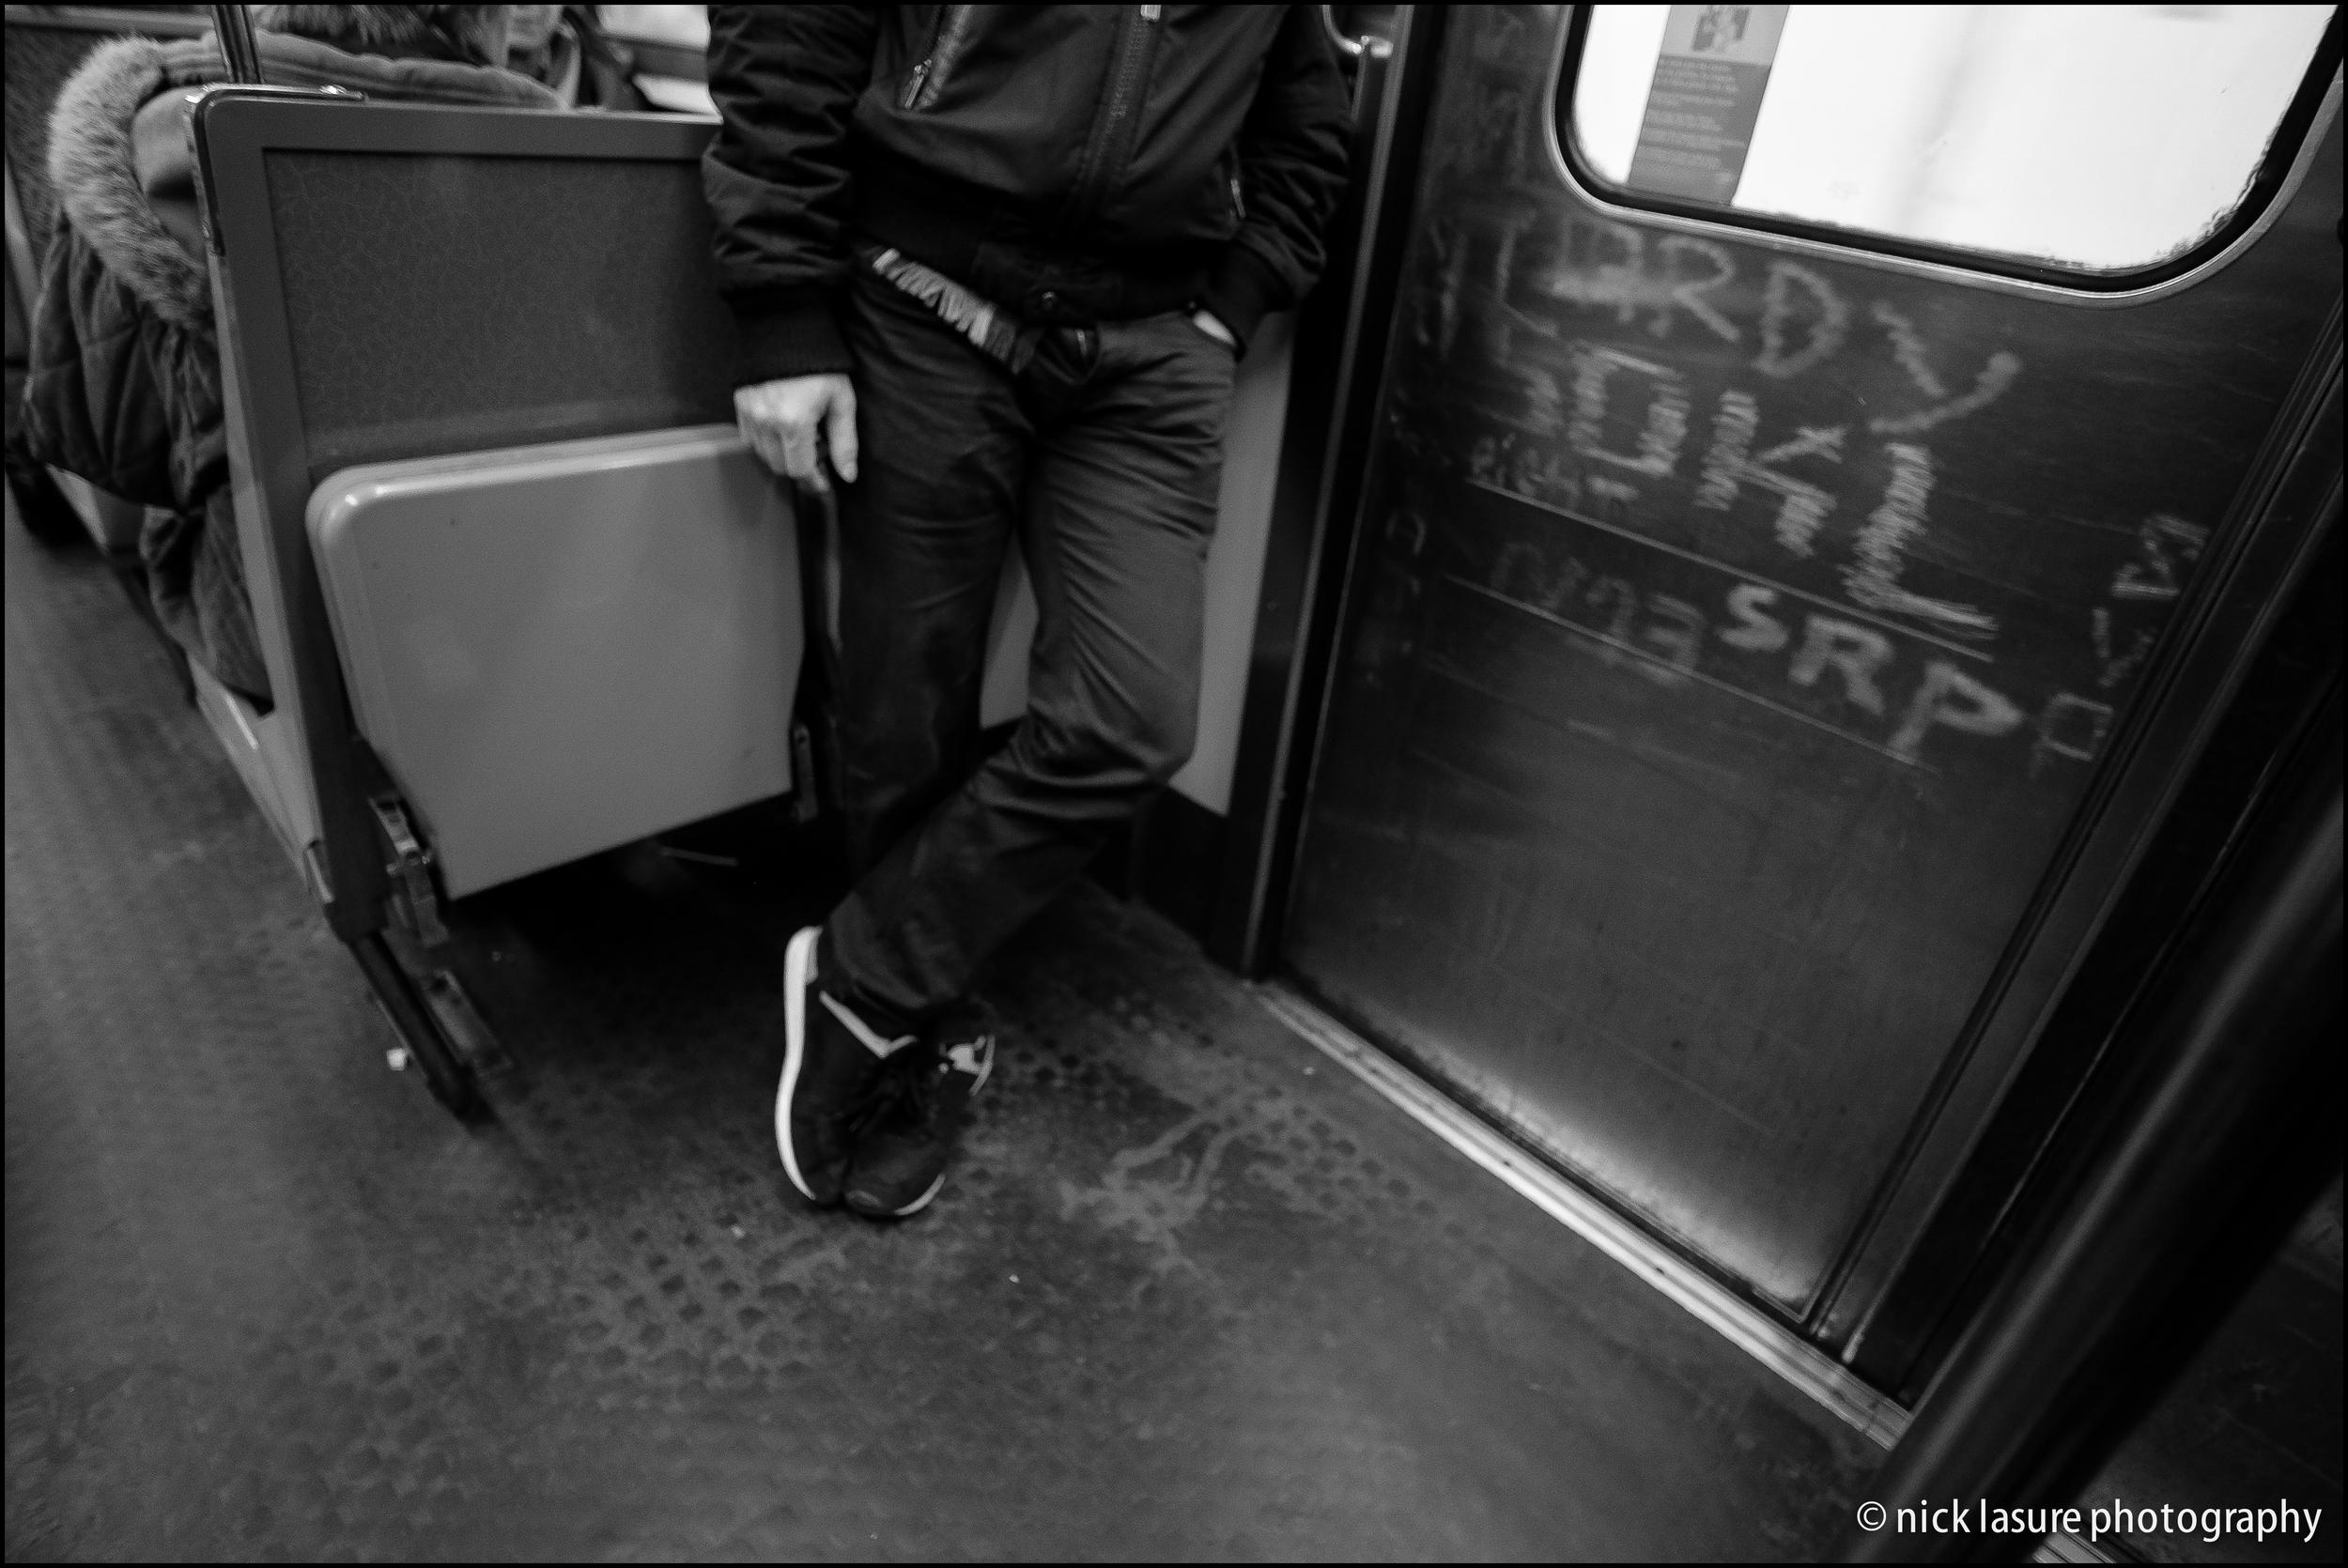 On the Metro | Fuji XT-1, XF 23mm